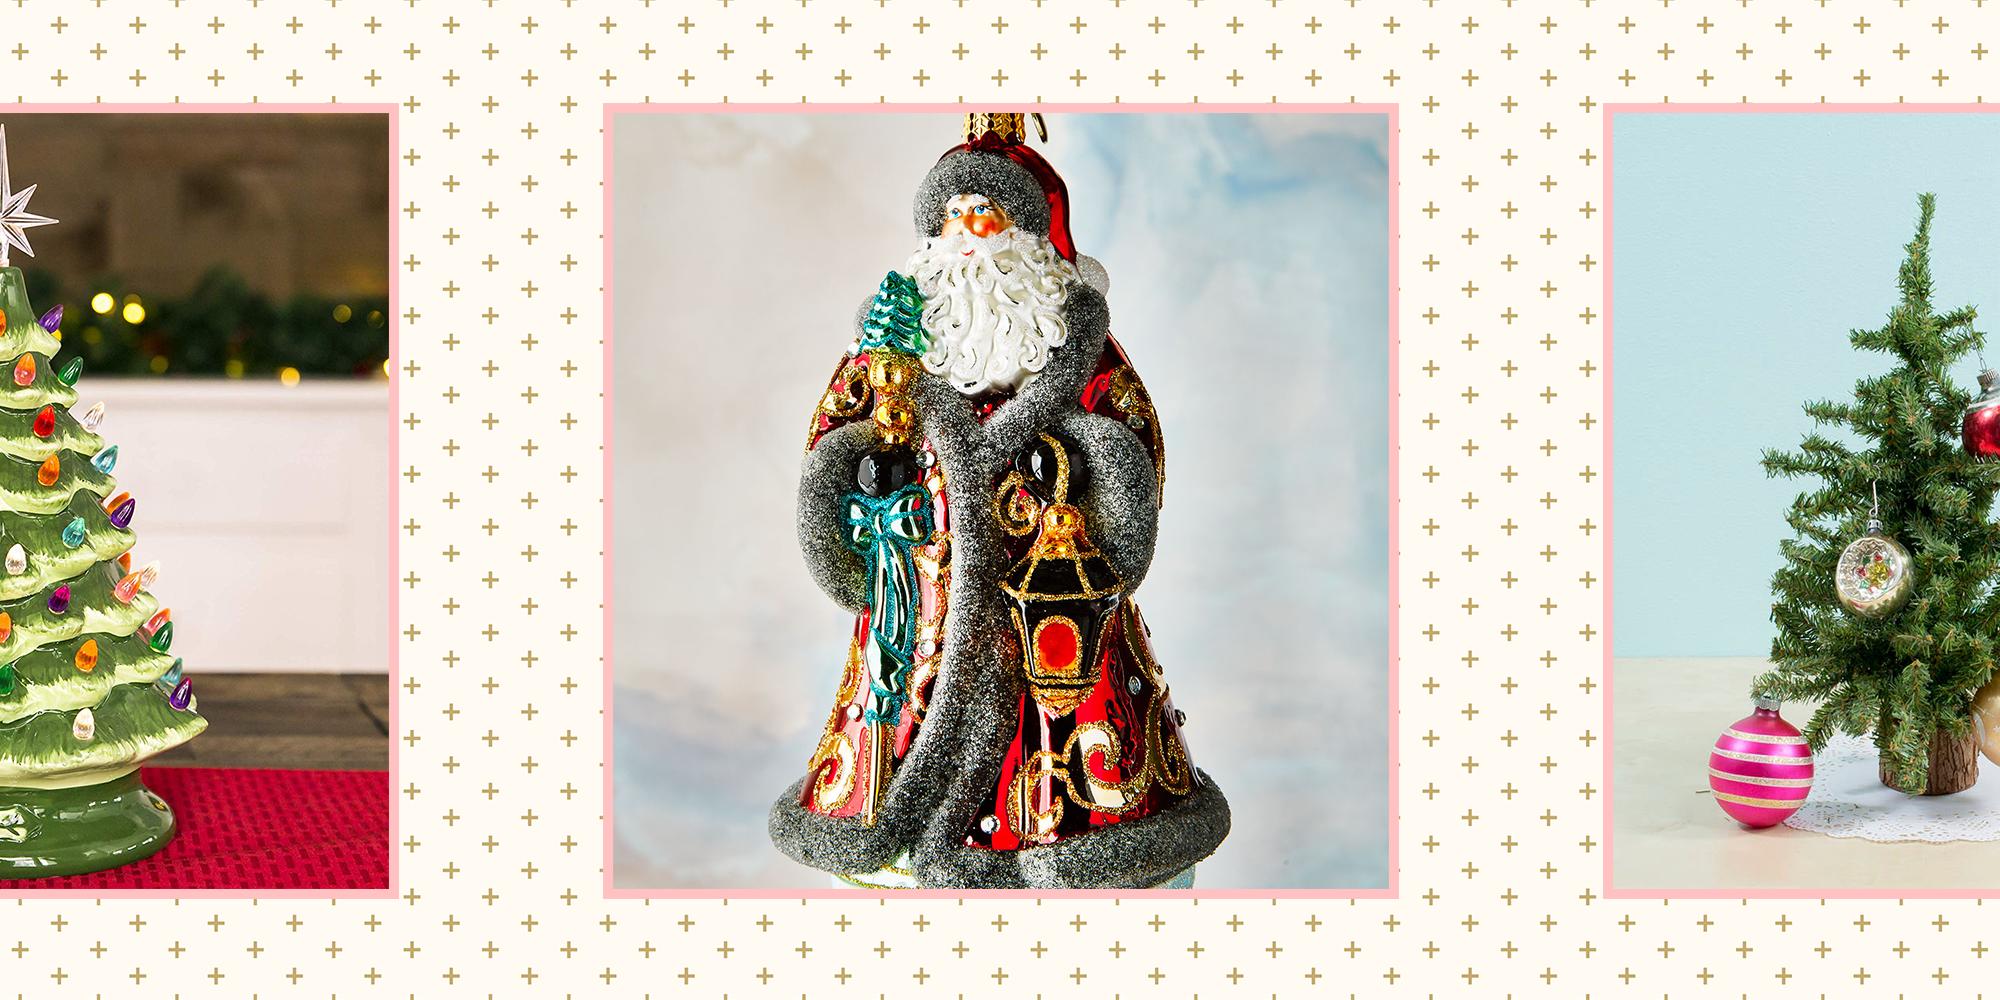 21 Best Vintage Christmas Decorations Retro Ornaments and Decor